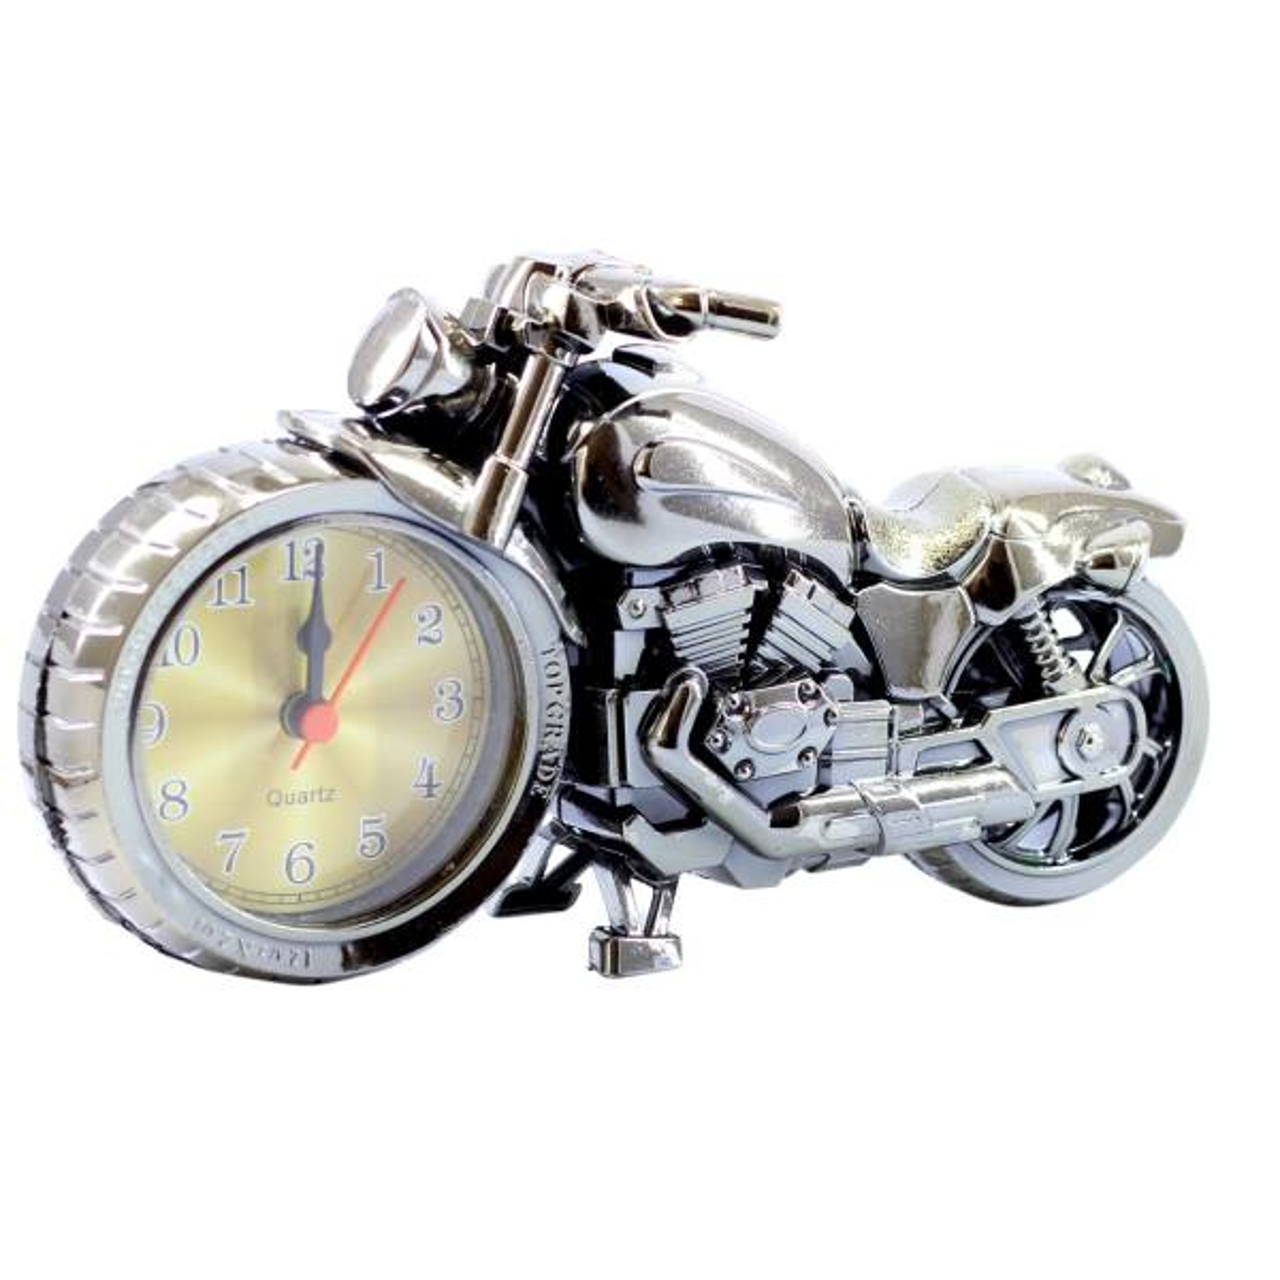 ساعت رومیزی ان پی مدل T303